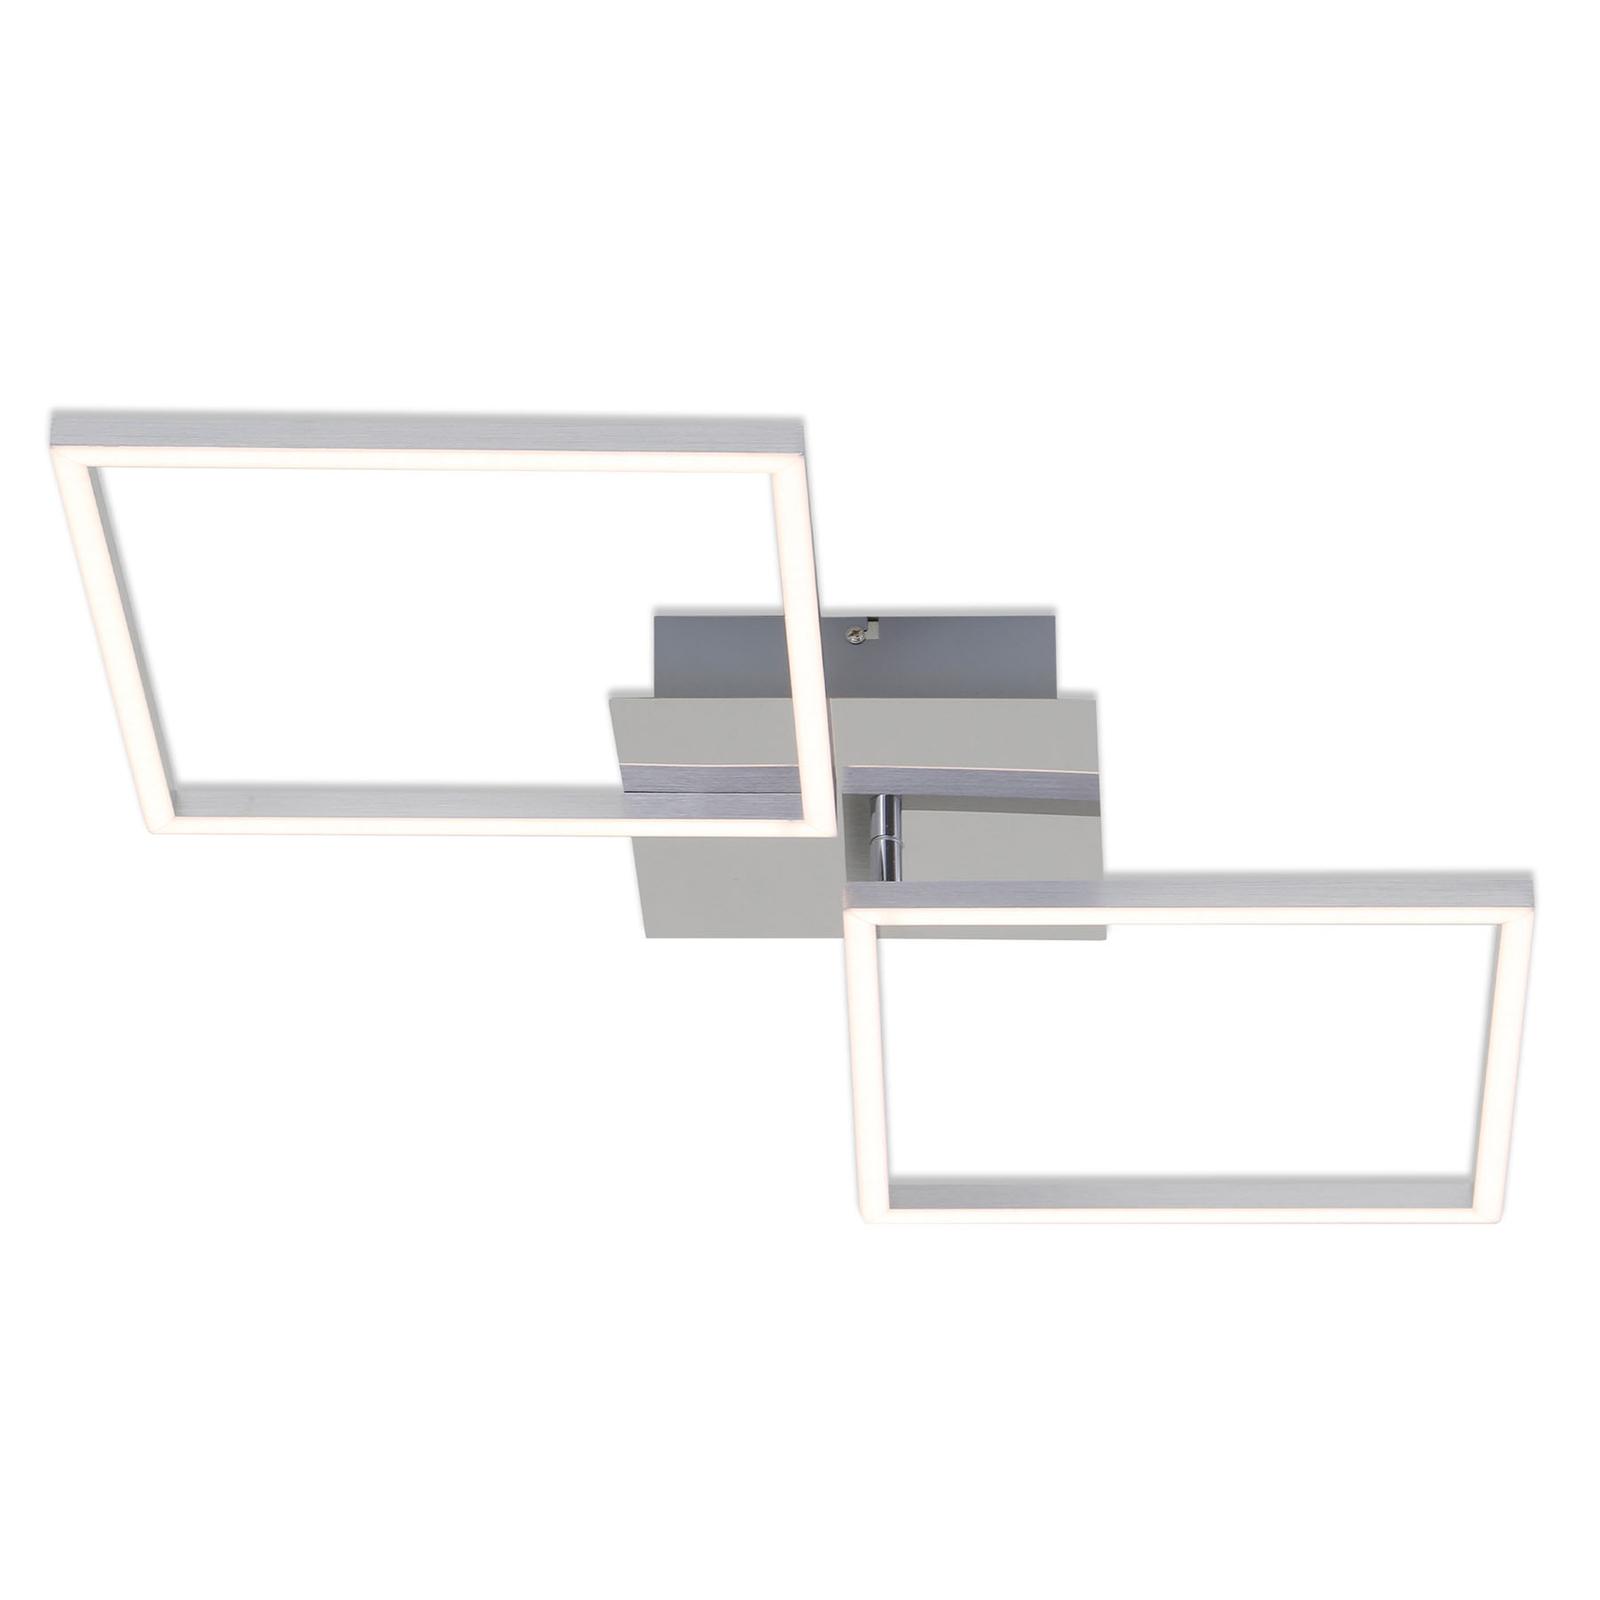 LED-Deckenlampe Frame, alu, 76x36cm